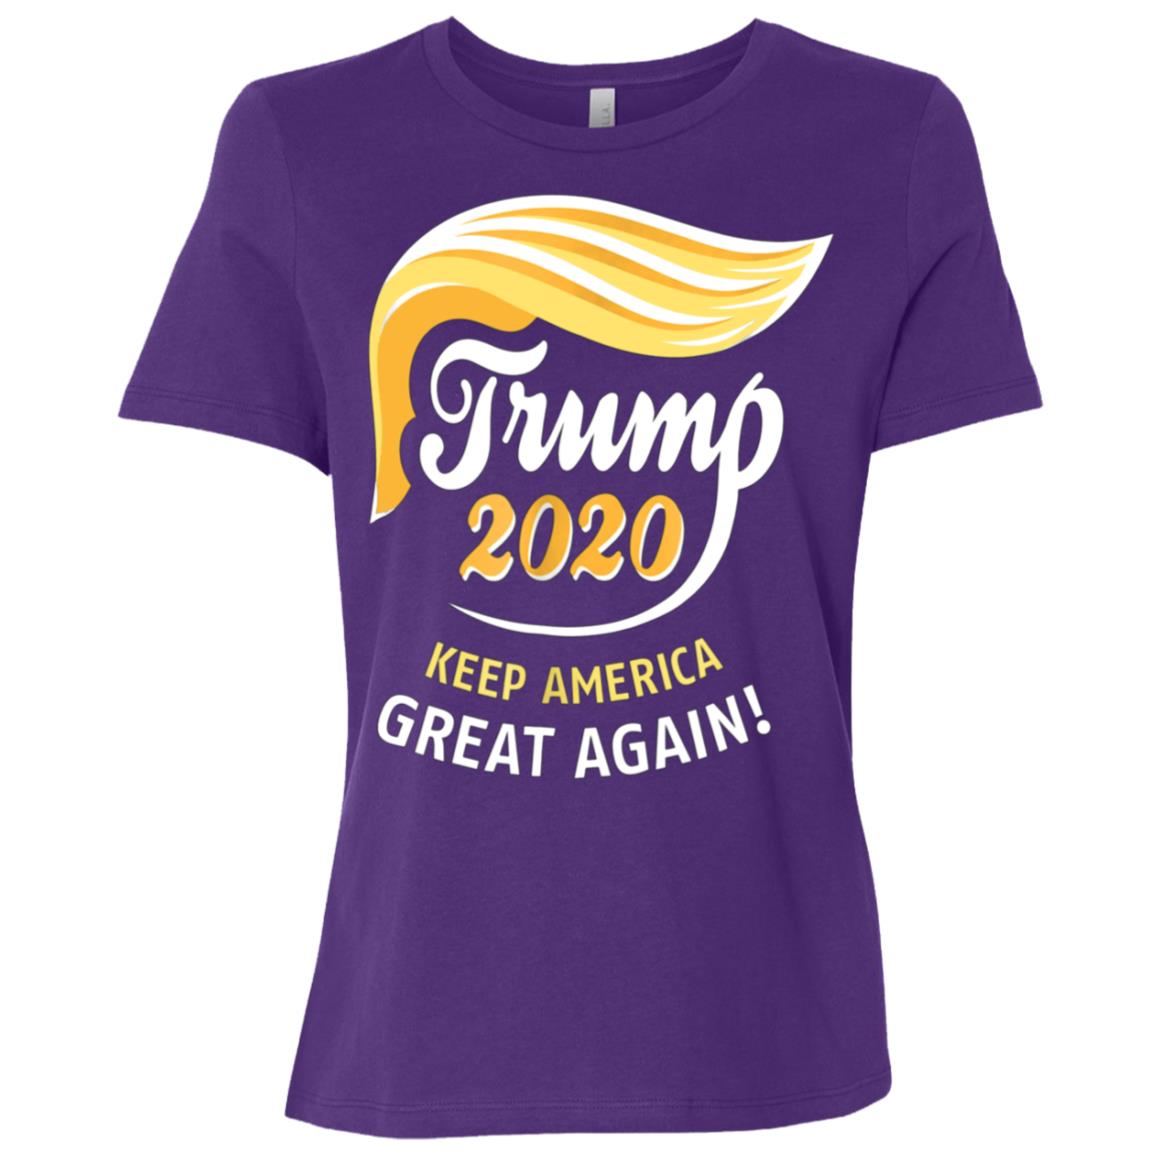 President Trump 2020 – KEEP AMERICA GREAT AGAIN! Women Short Sleeve T-Shirt